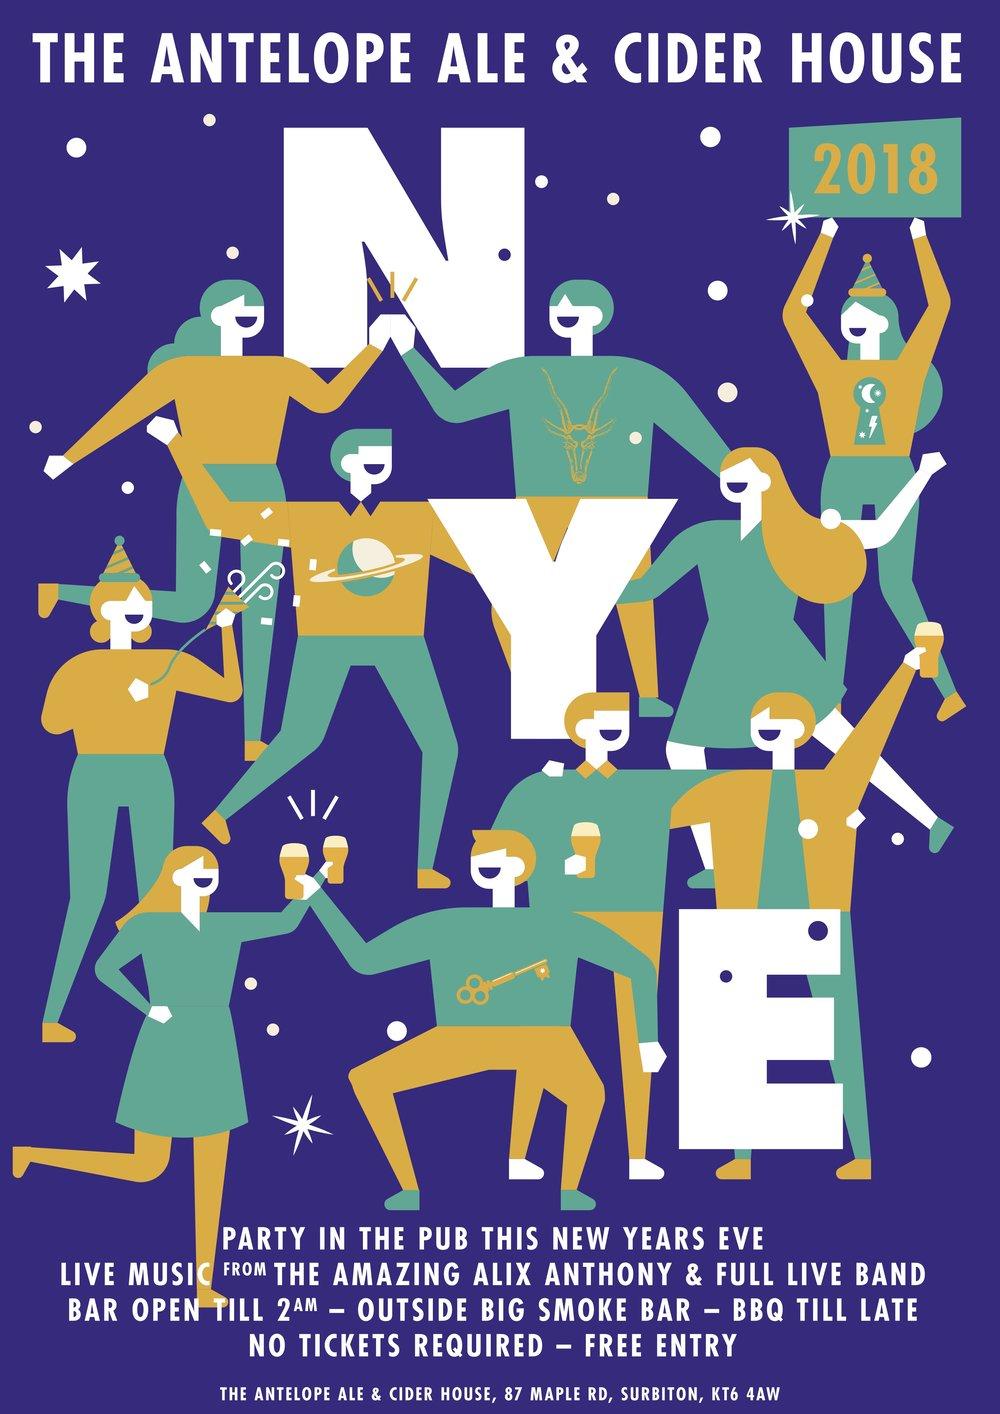 Antelope_Albion_NYE_Posters_2018.jpg